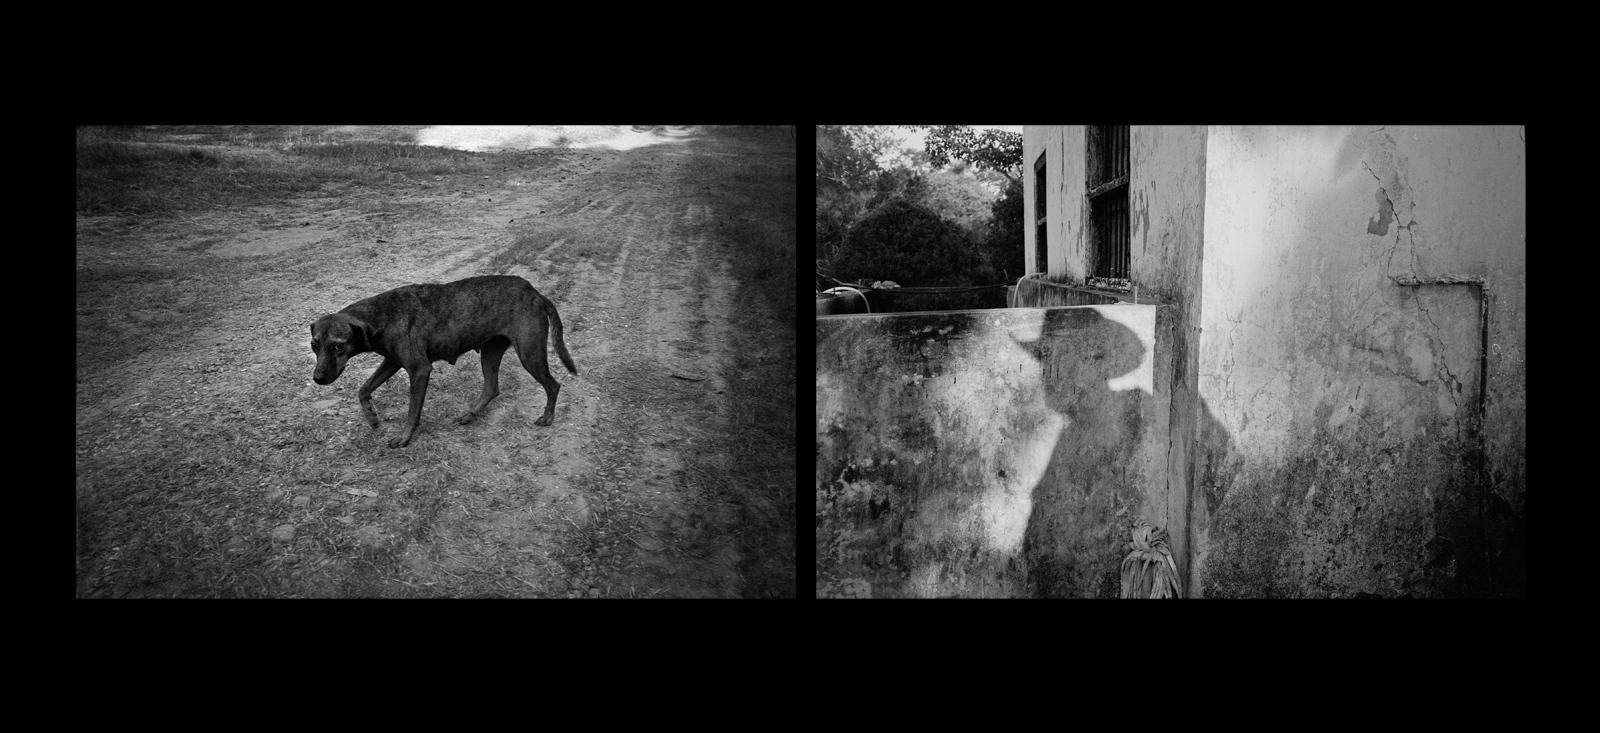 Art and Documentary Photography - Loading 11_El_Perro_y_La_Sombra__sdeswaan.jpg